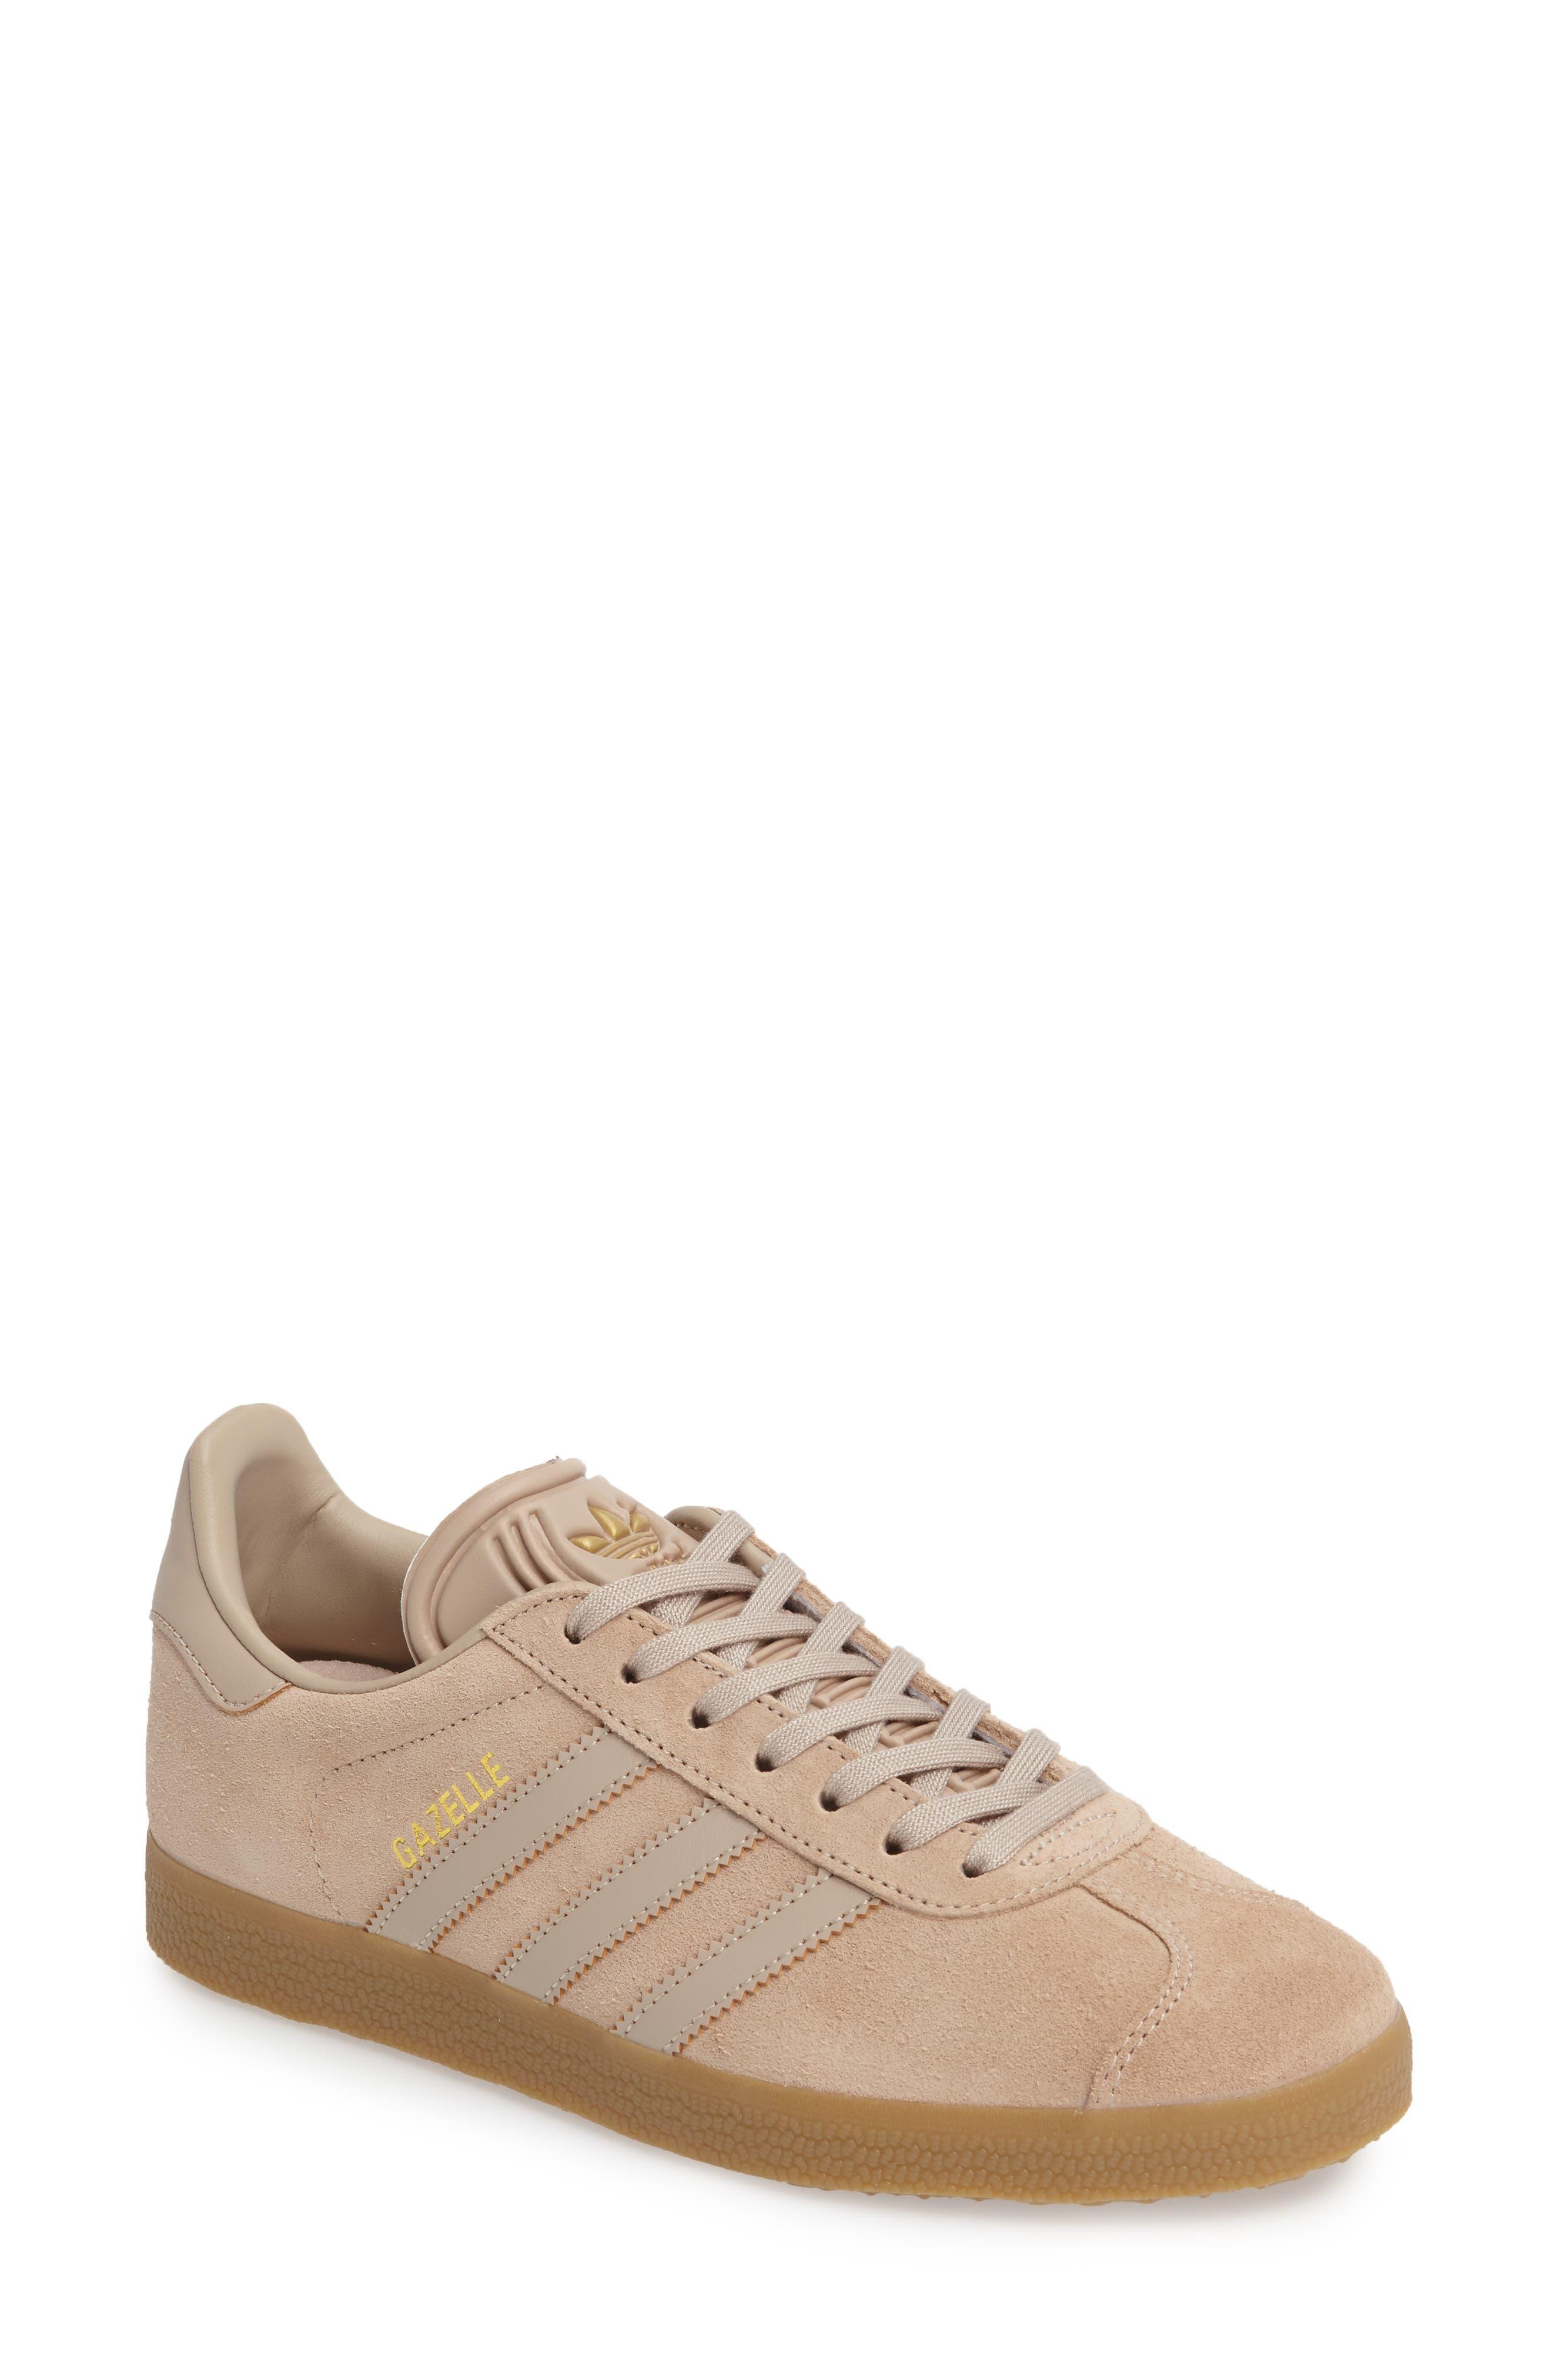 Alternate Image 1 Selected - adidas Gazelle Sneaker (Women)